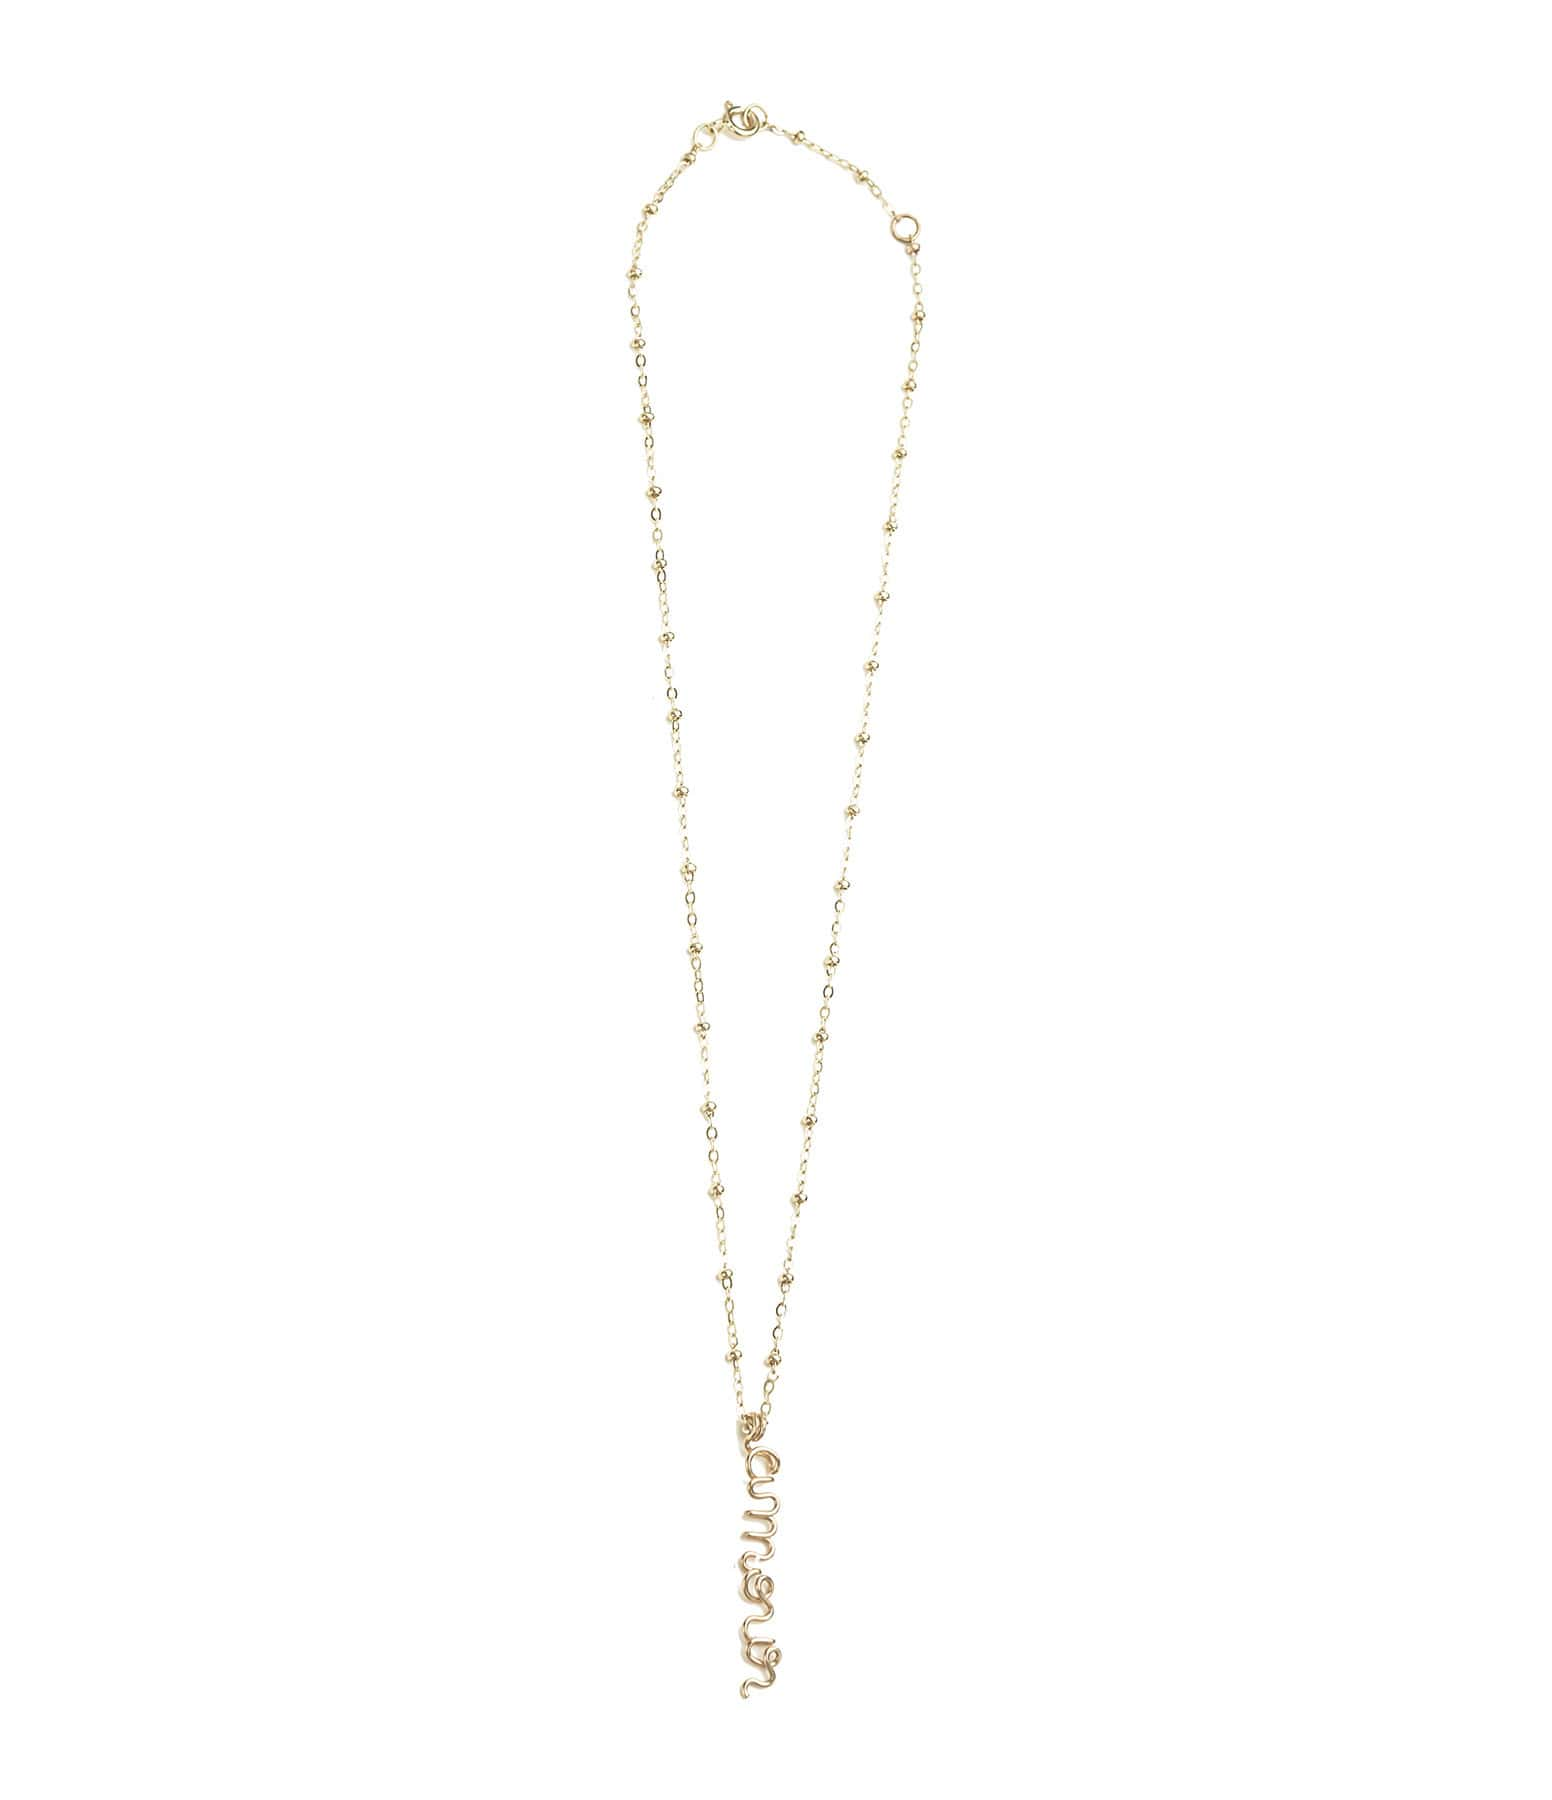 ATELIER PAULIN - Collier Pendentif Original Amour Gold Filled 14K